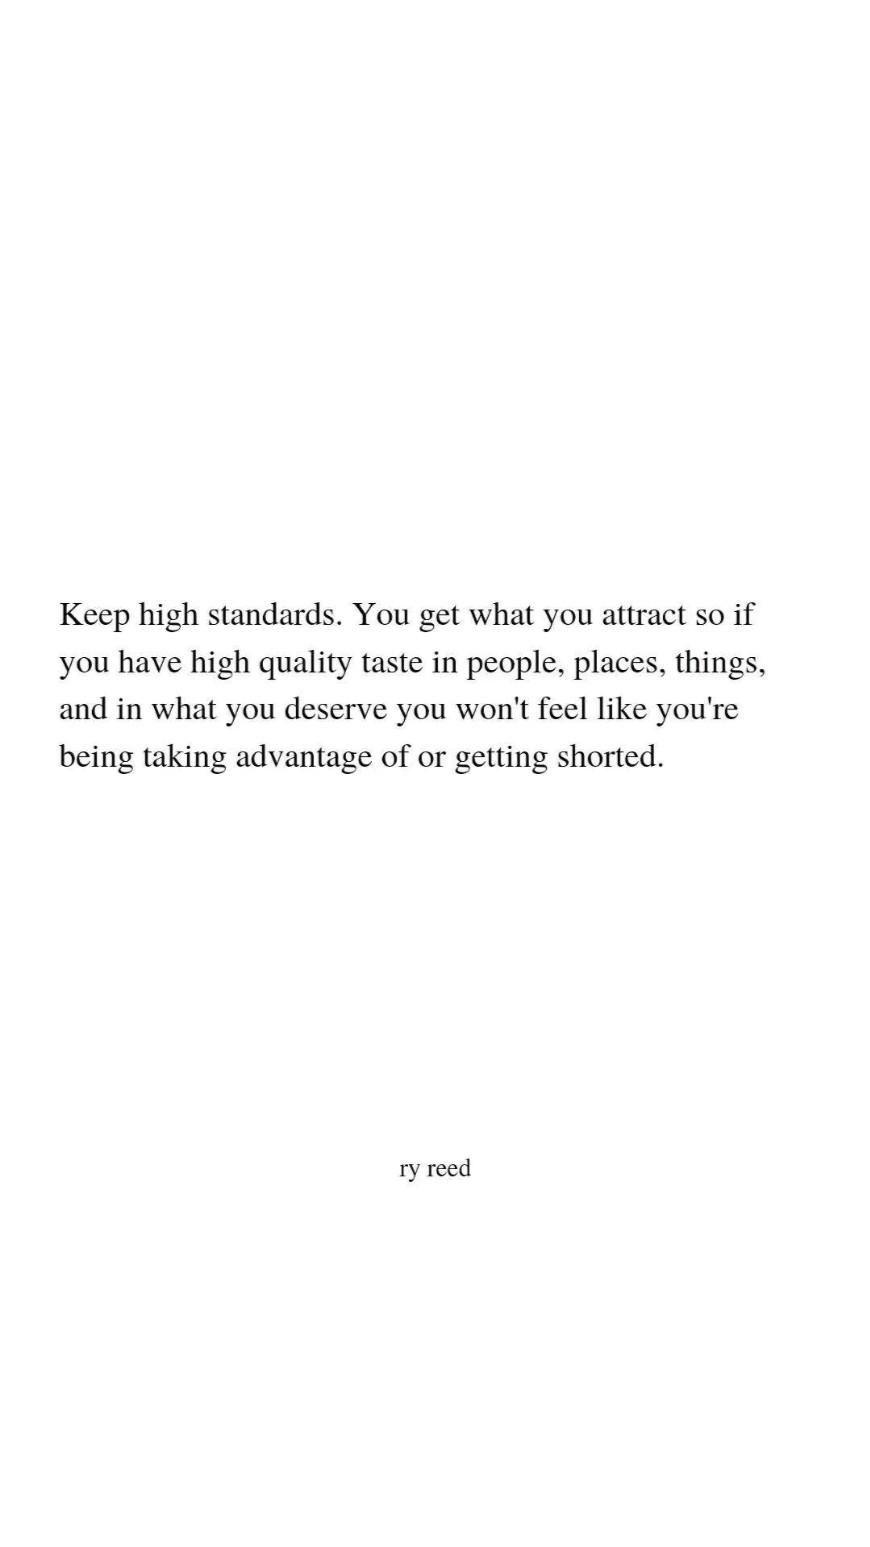 keep those standards high